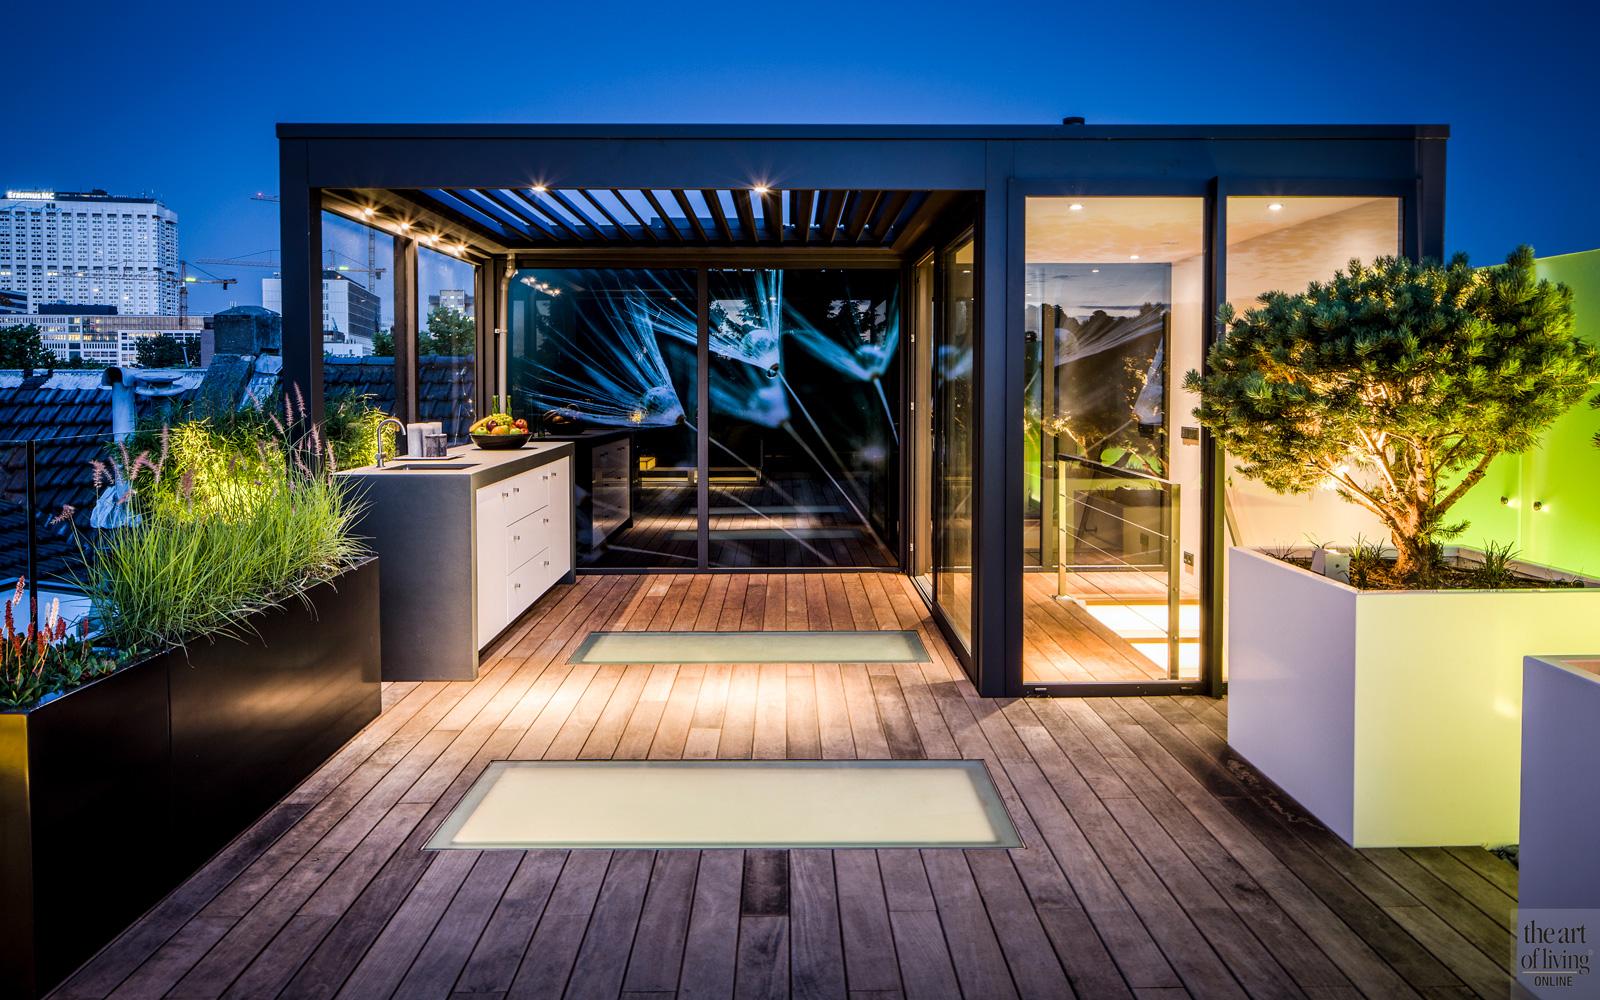 Modern dakterras, Erik van Gelder, Livium, Tablazz, buitenkeuken, Oskamp Interieurs